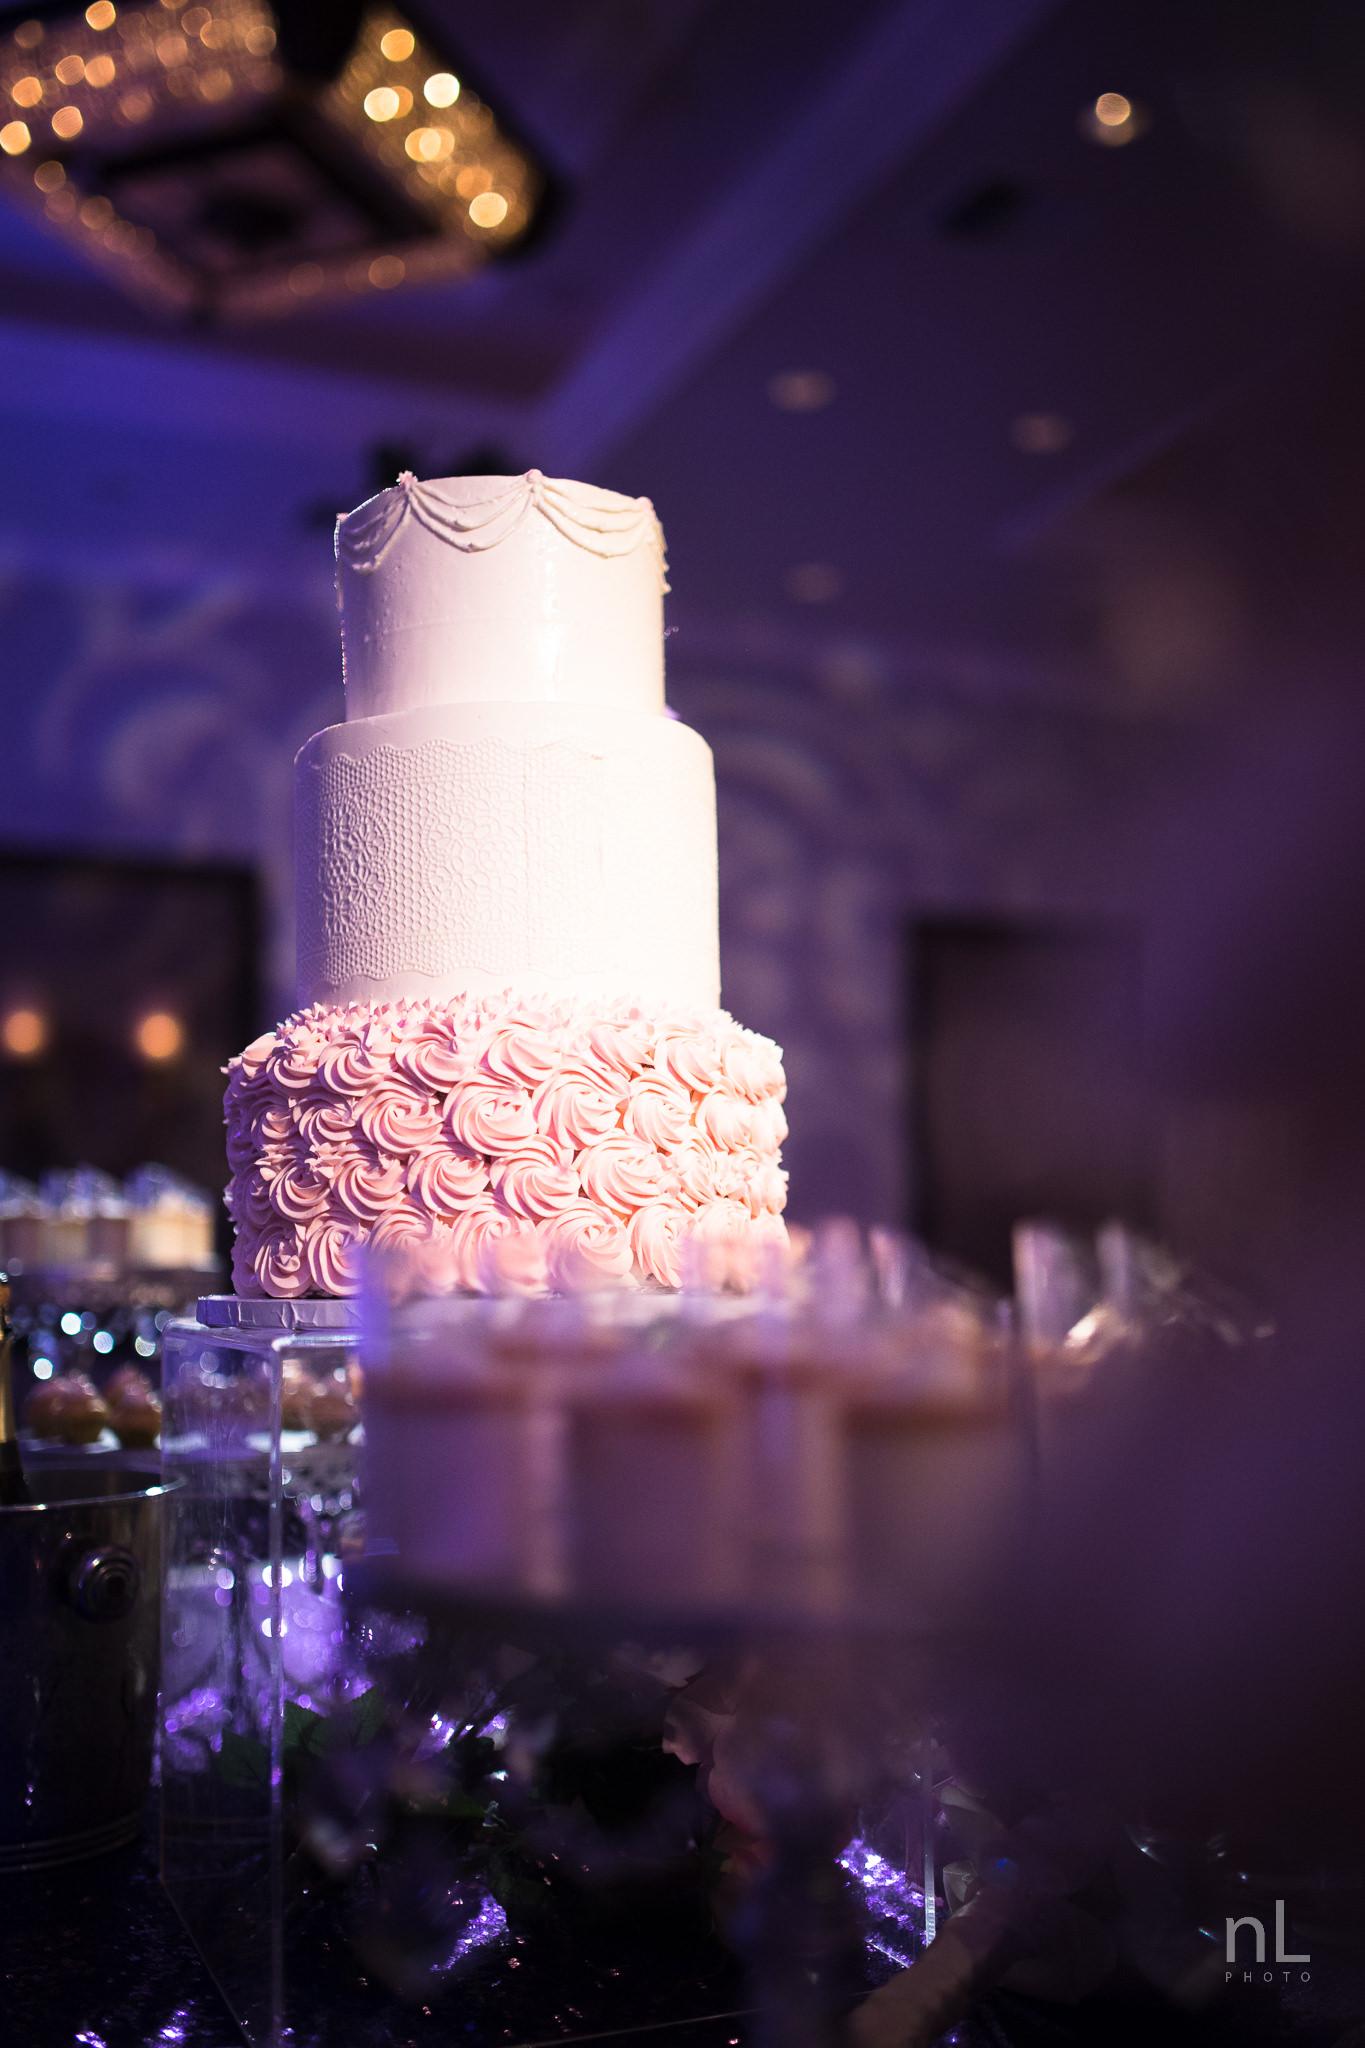 nick-lie-photography-los-angeles-wedding-photographer-29.jpg